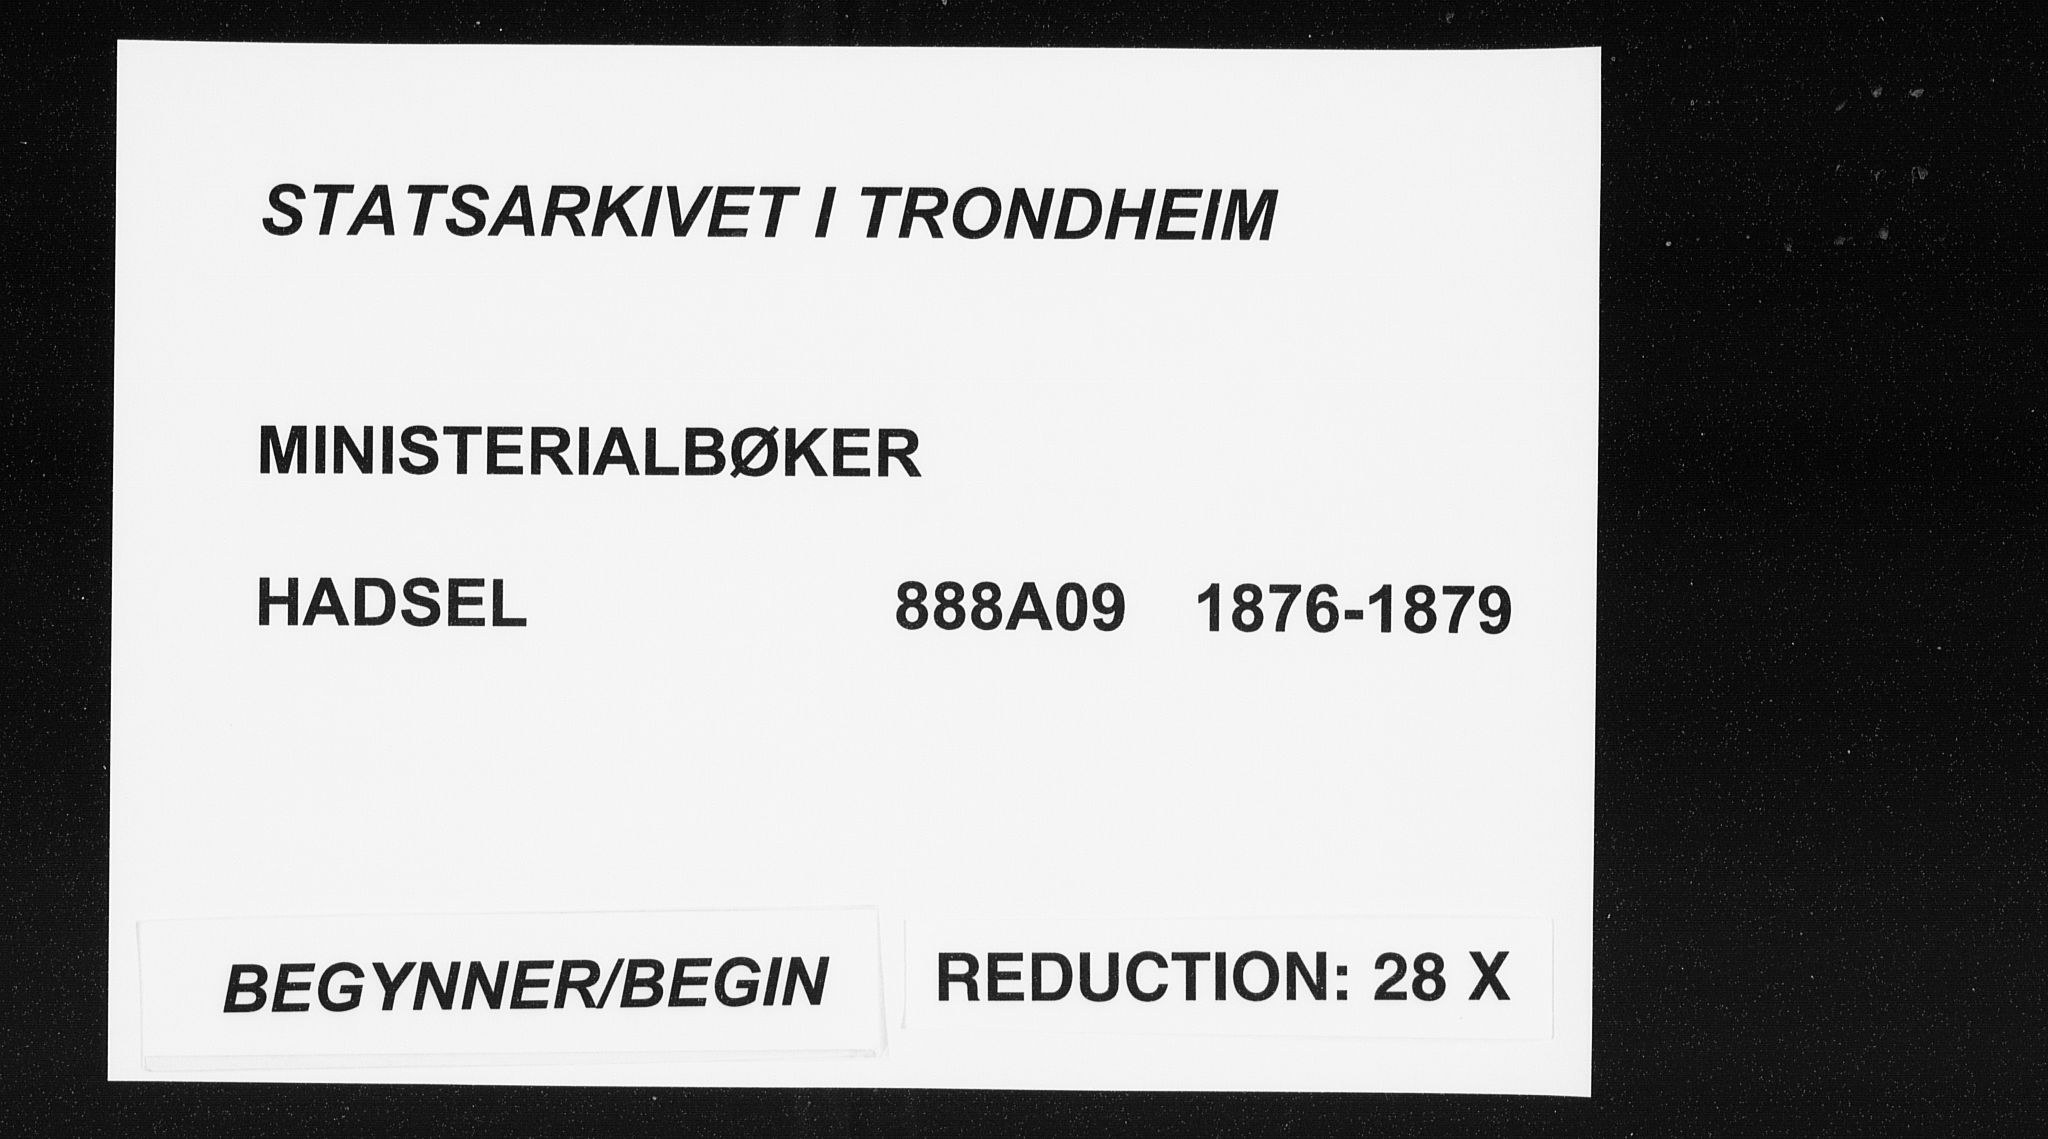 SAT, Ministerialprotokoller, klokkerbøker og fødselsregistre - Nordland, 888/L1243: Ministerialbok nr. 888A09, 1876-1879